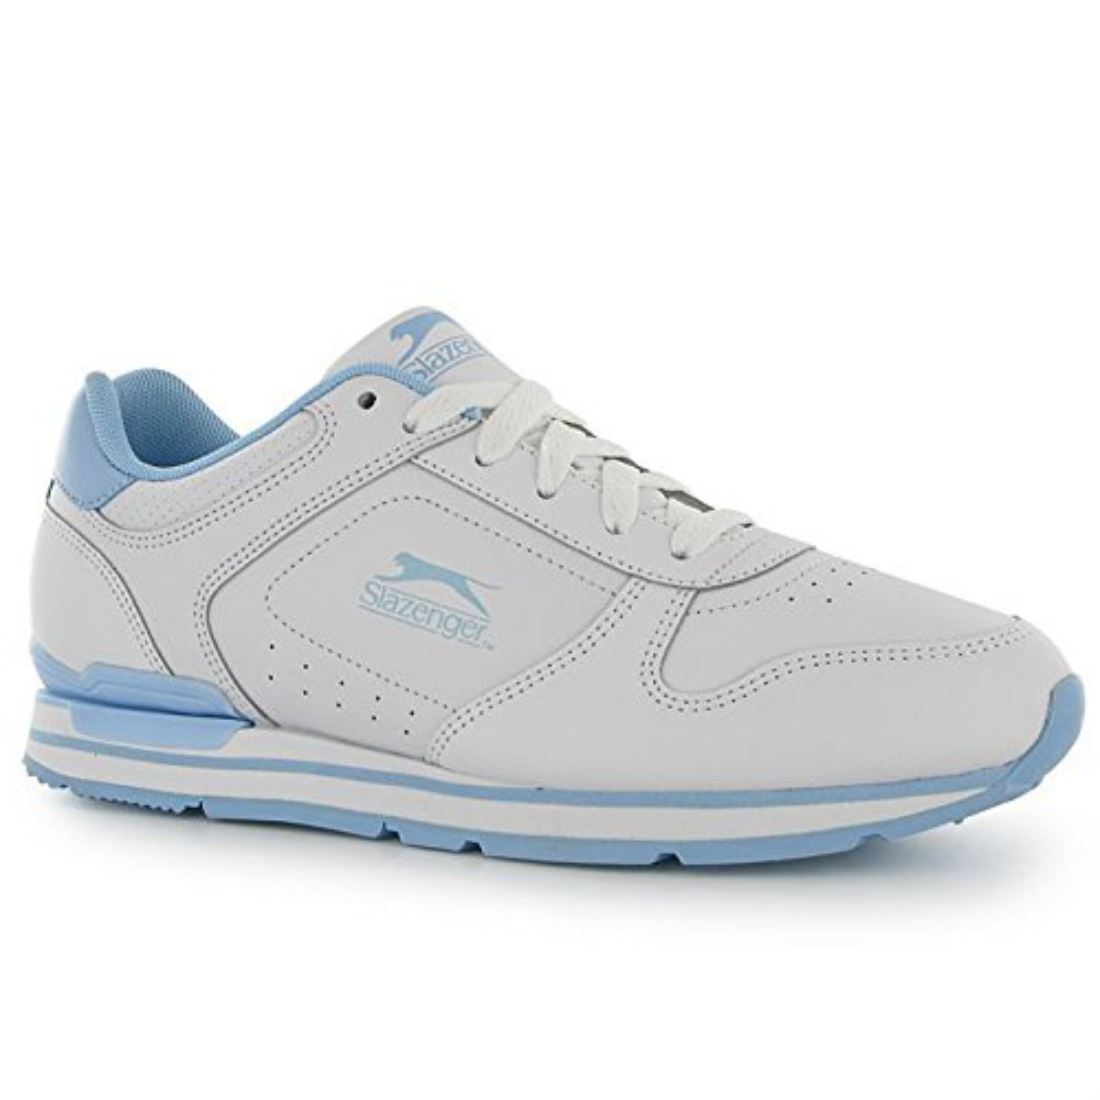 C Champion Womens Shoes